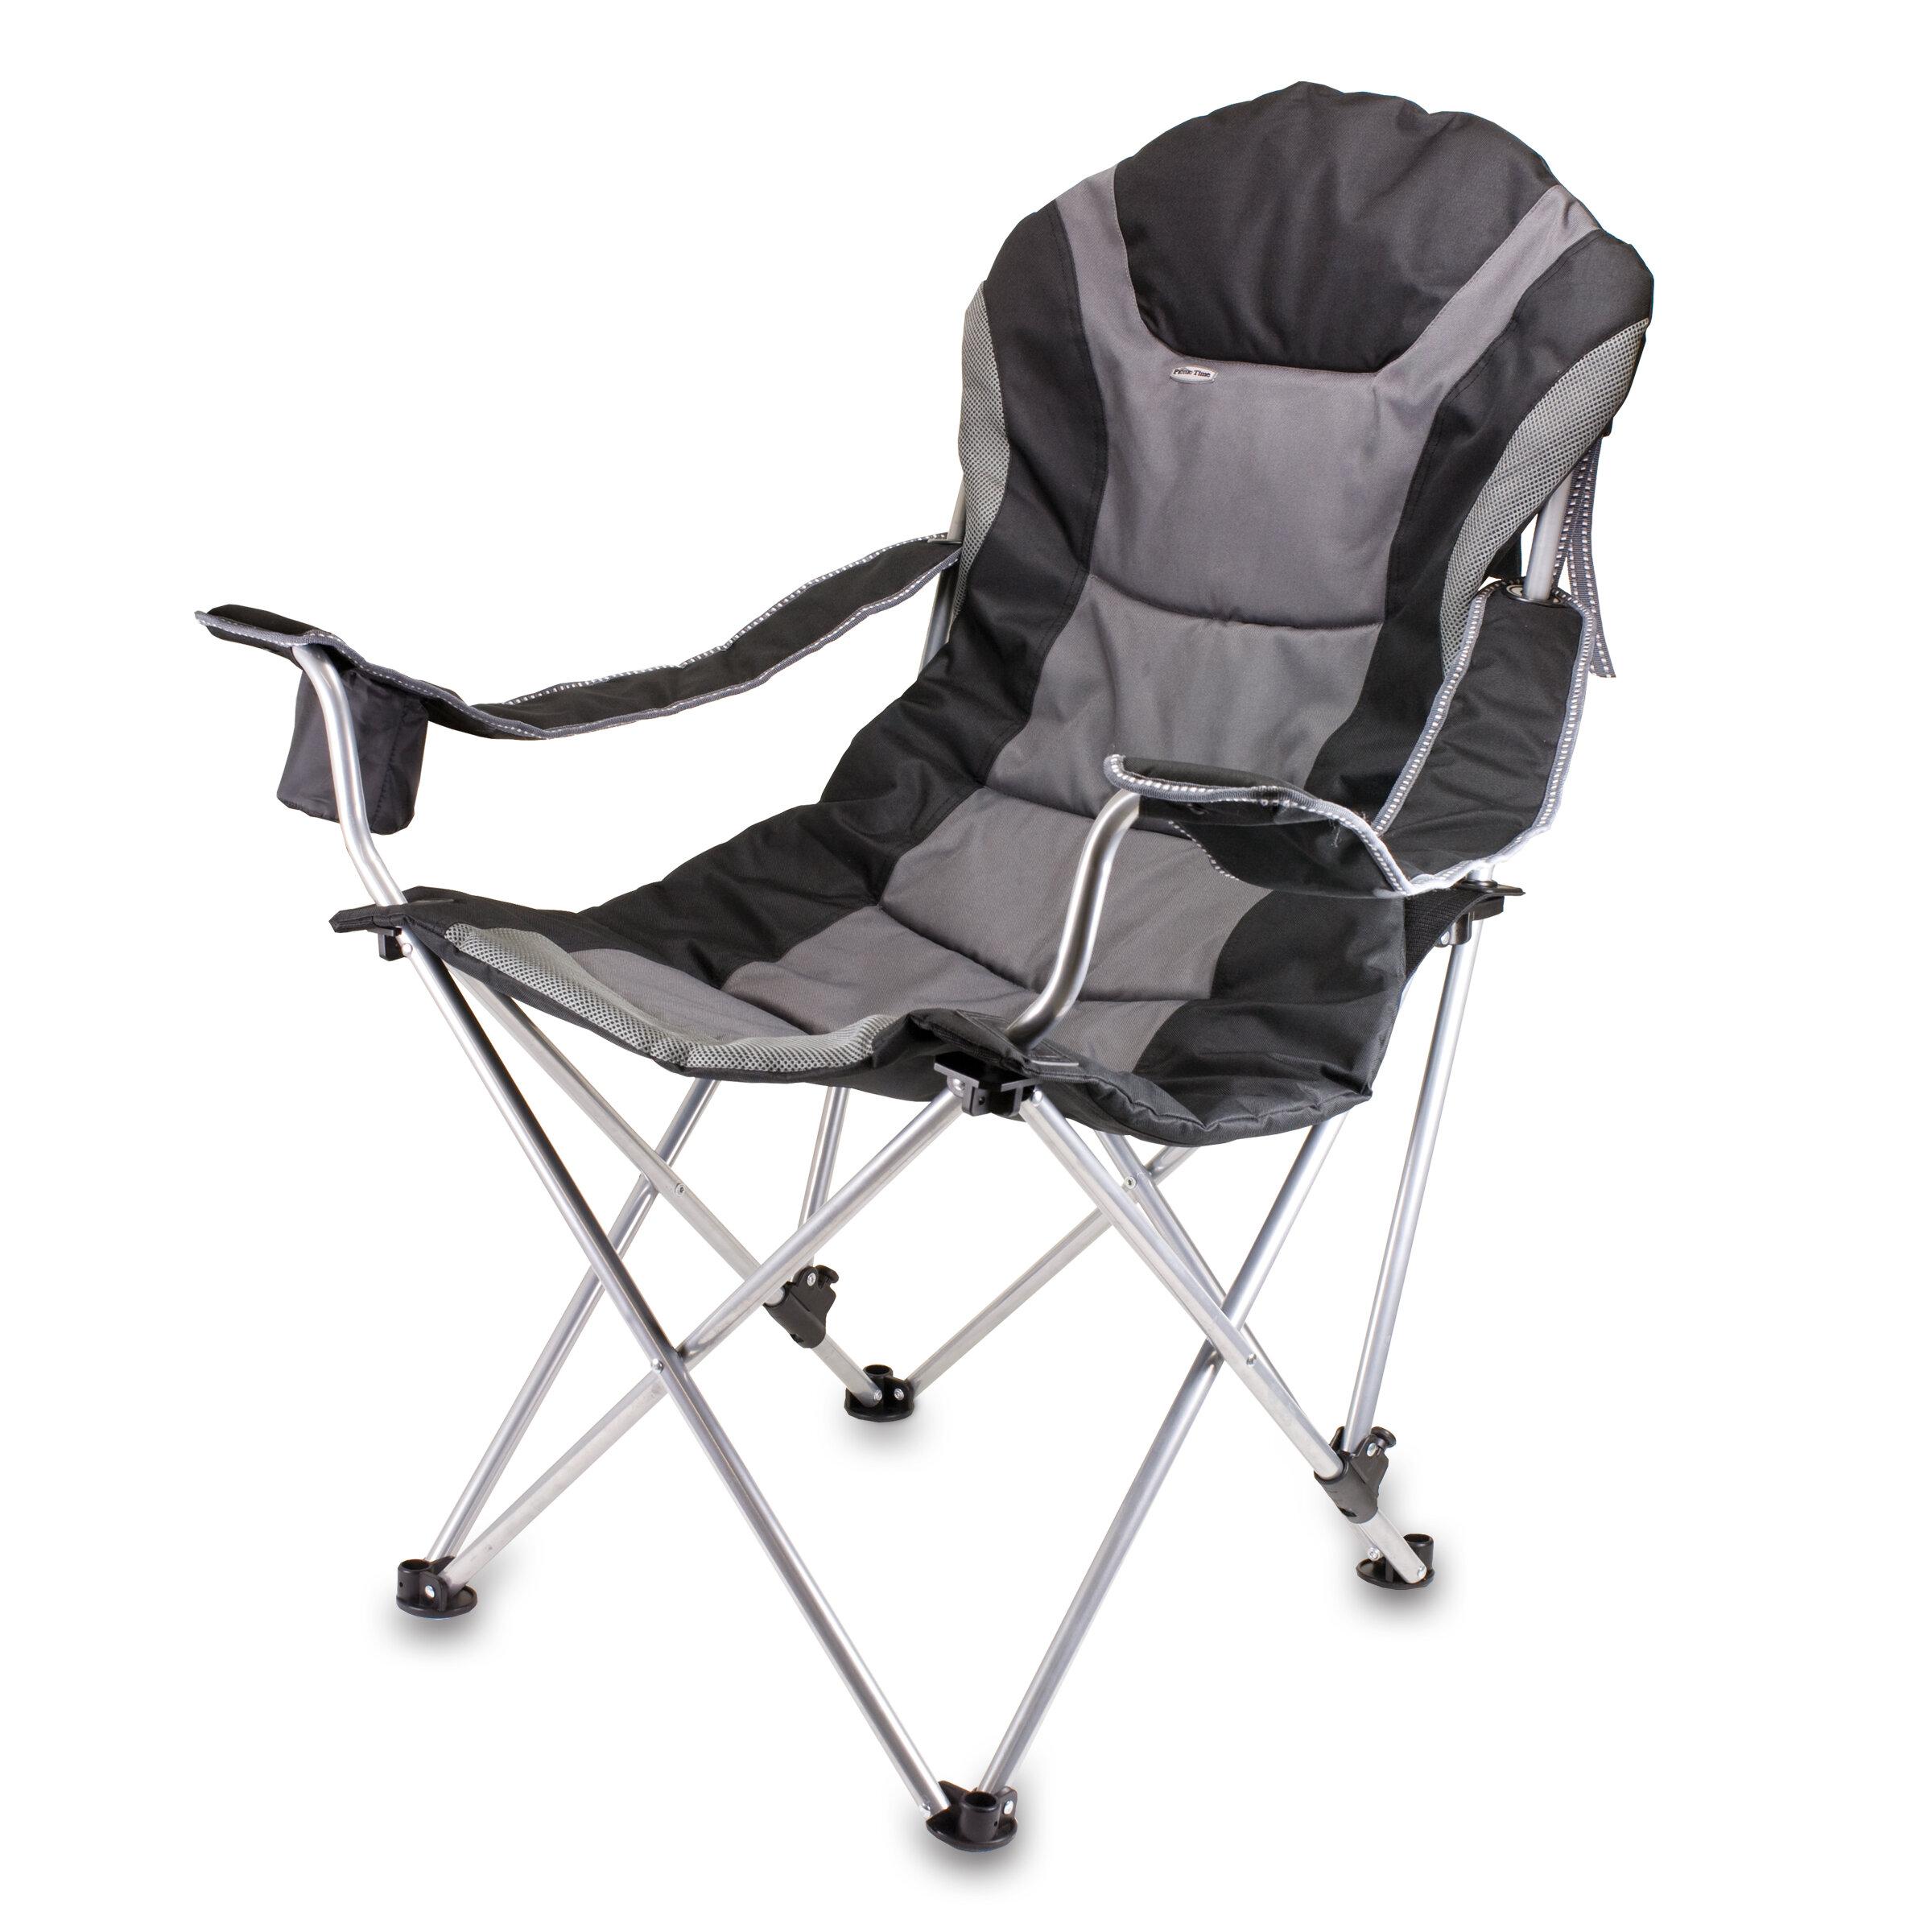 Freeport Park Shipley Reclining Camping Chair U0026 Reviews | Wayfair